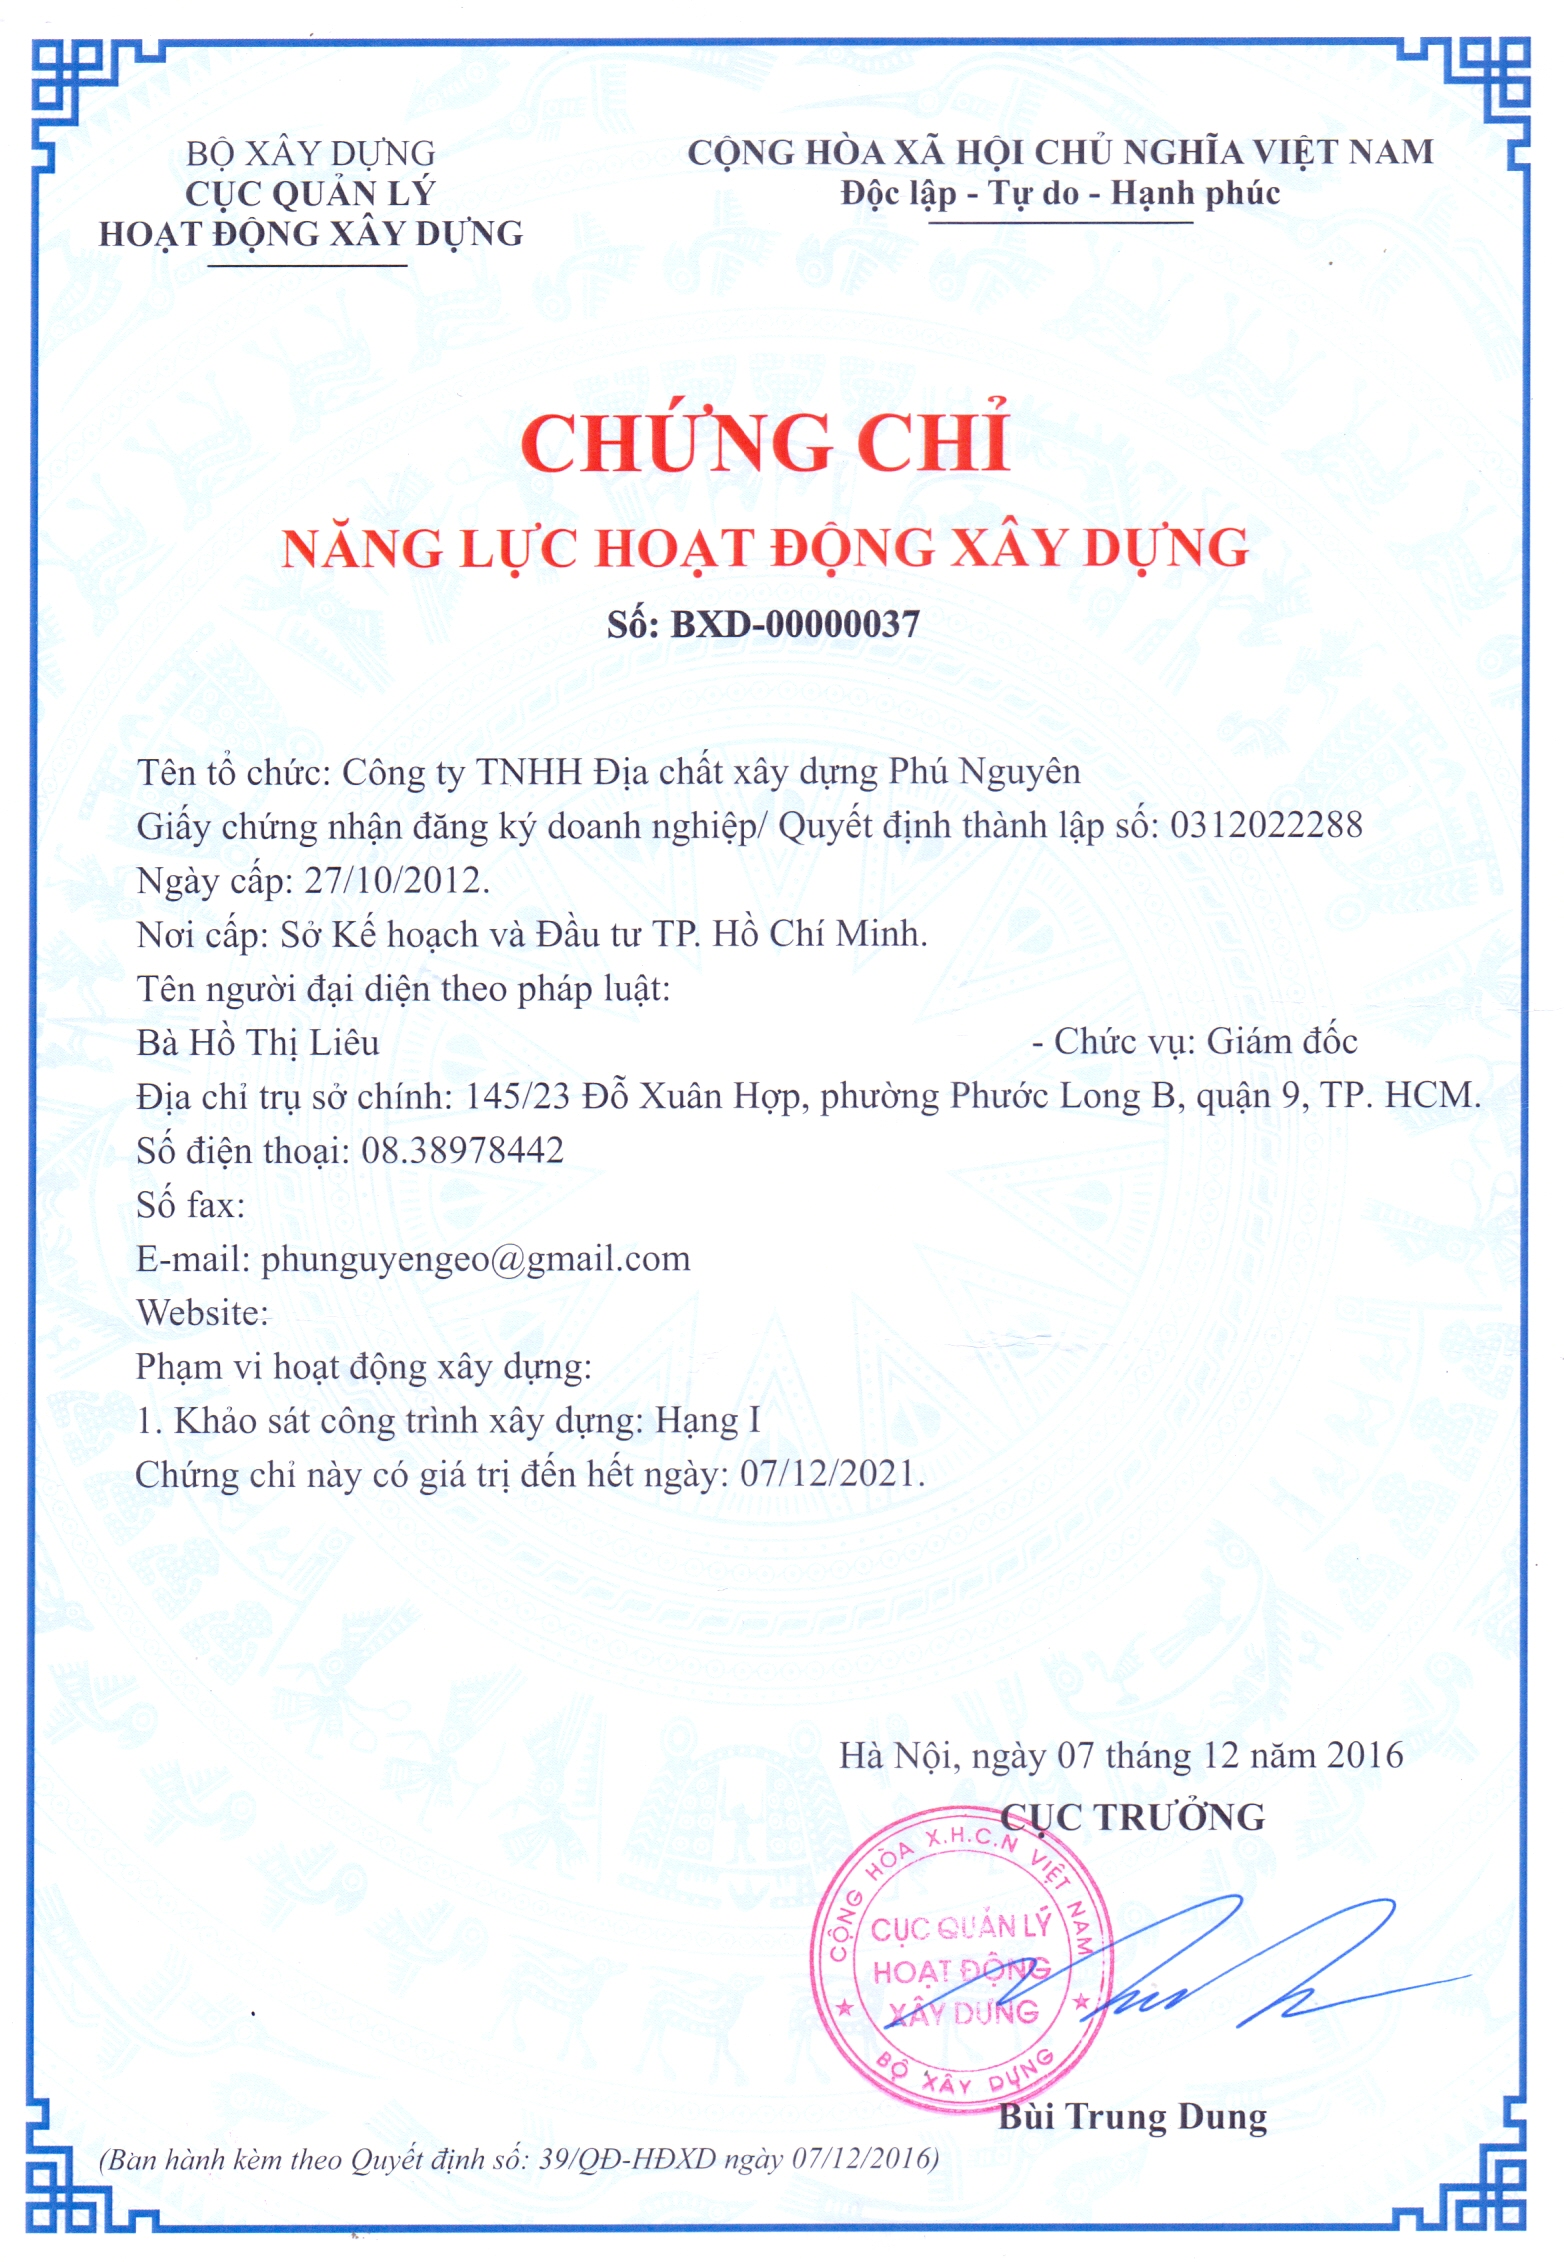 Chung chi nang luc khao sat xay dung PNgeo